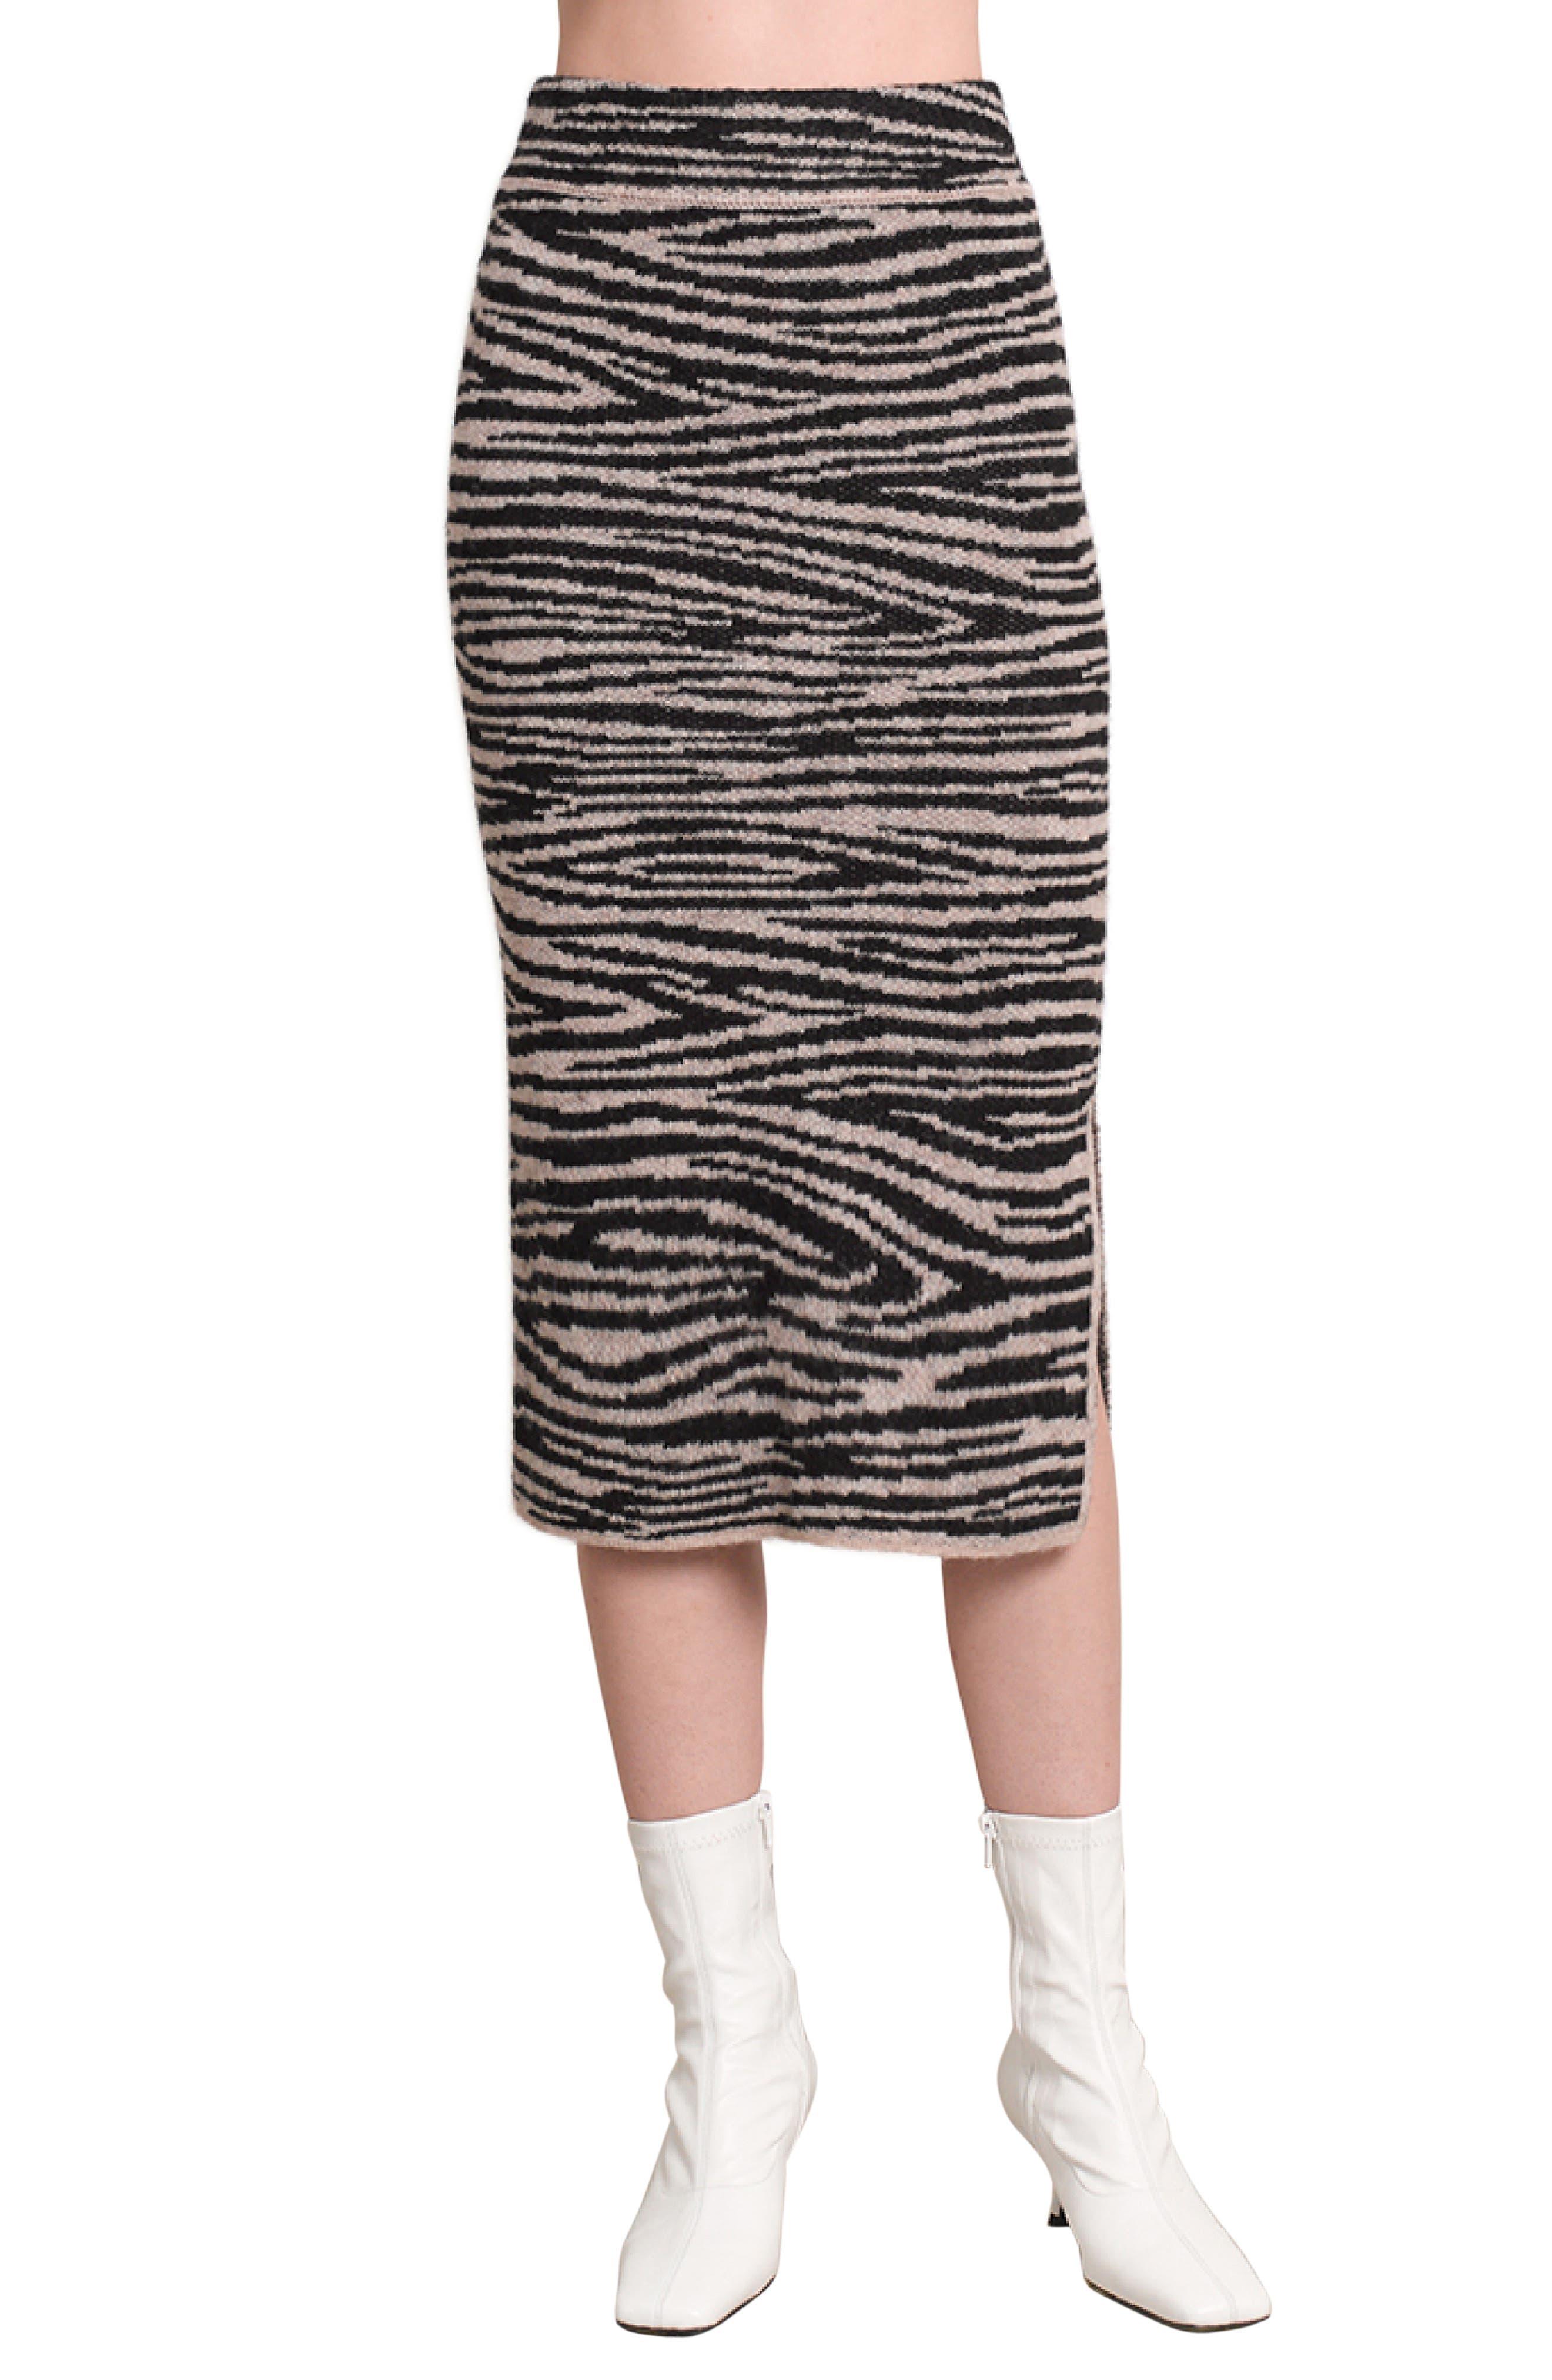 Eleven Six Juno Animal Print Alpaca & Merino Wool Blend Skirt